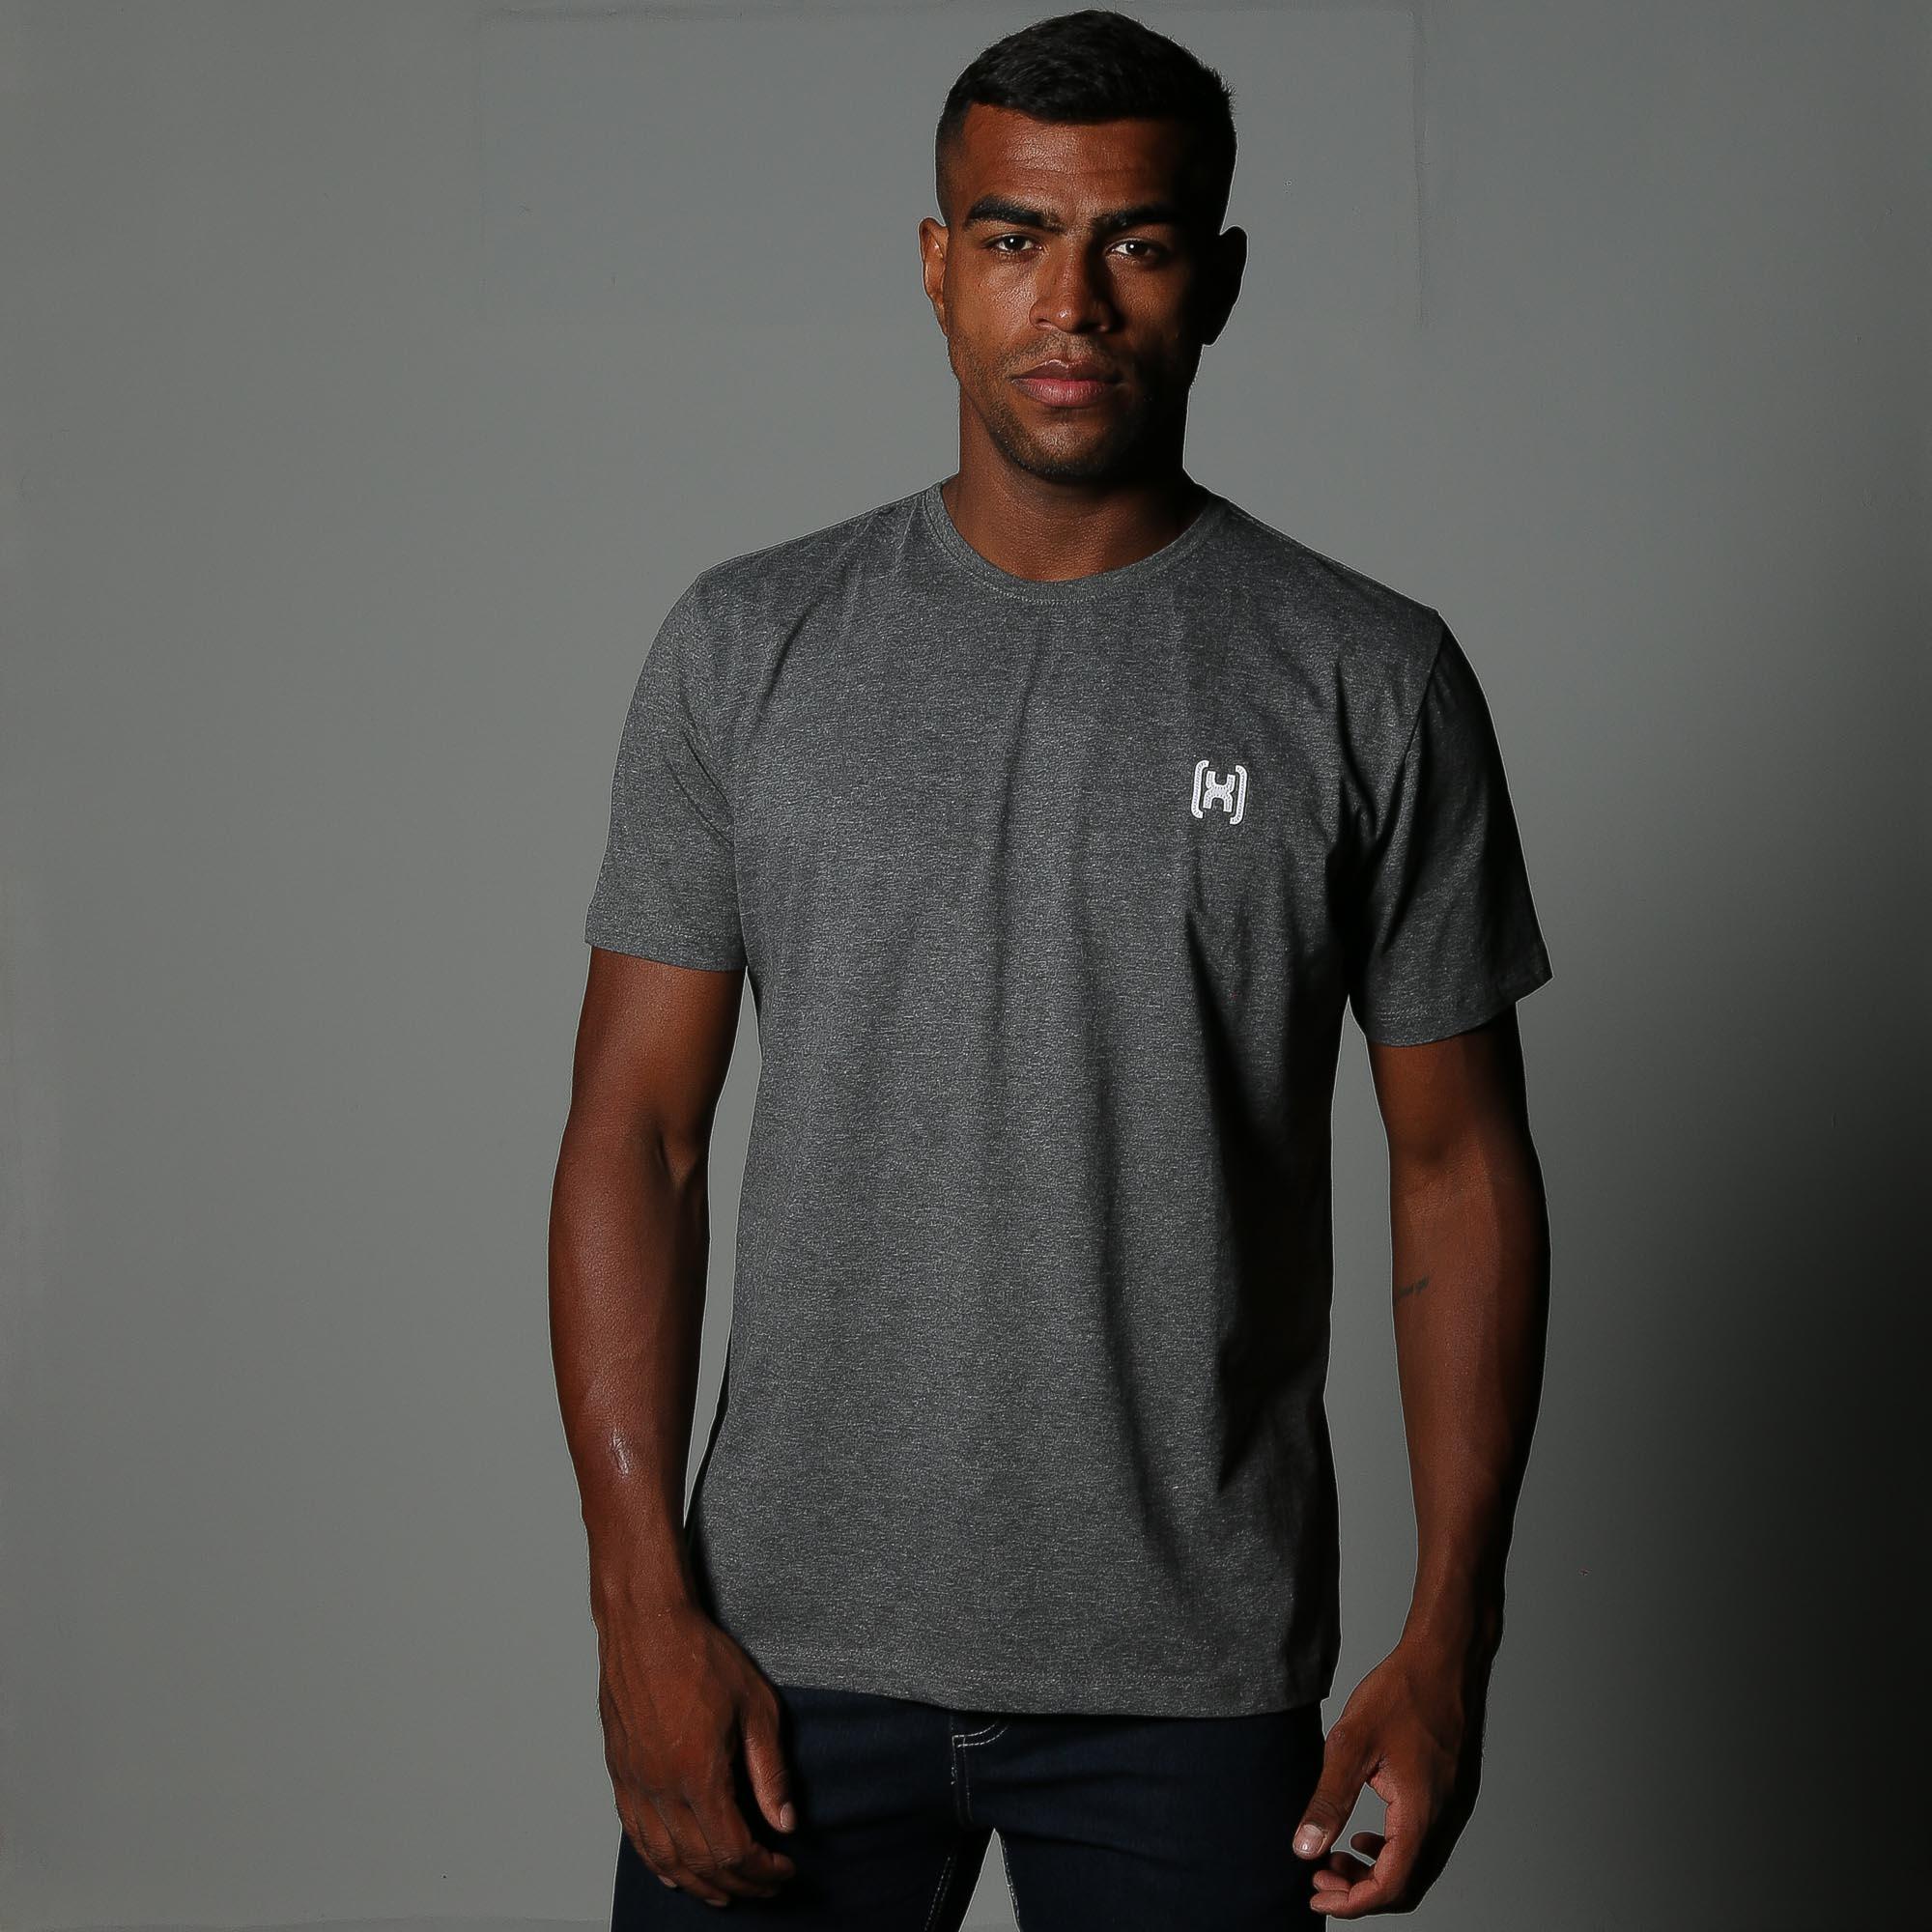 Camiseta Masculina TXC 1797